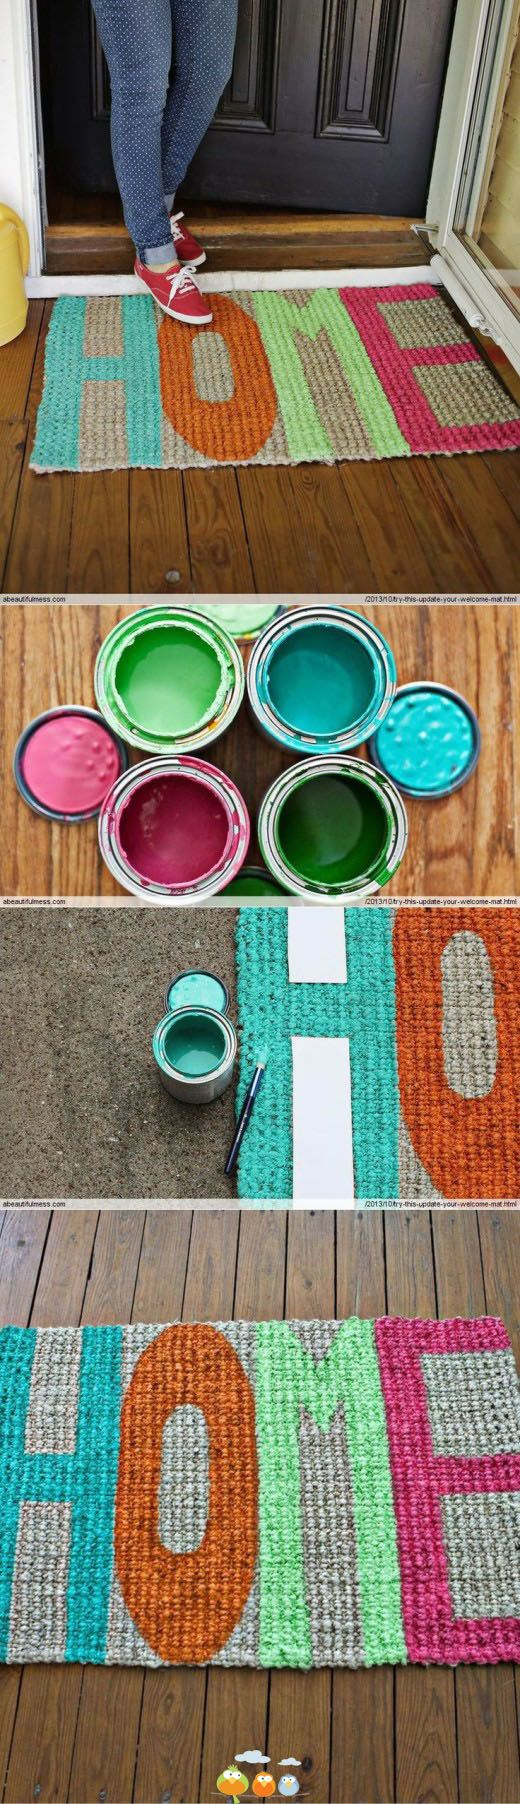 cute welcome mat